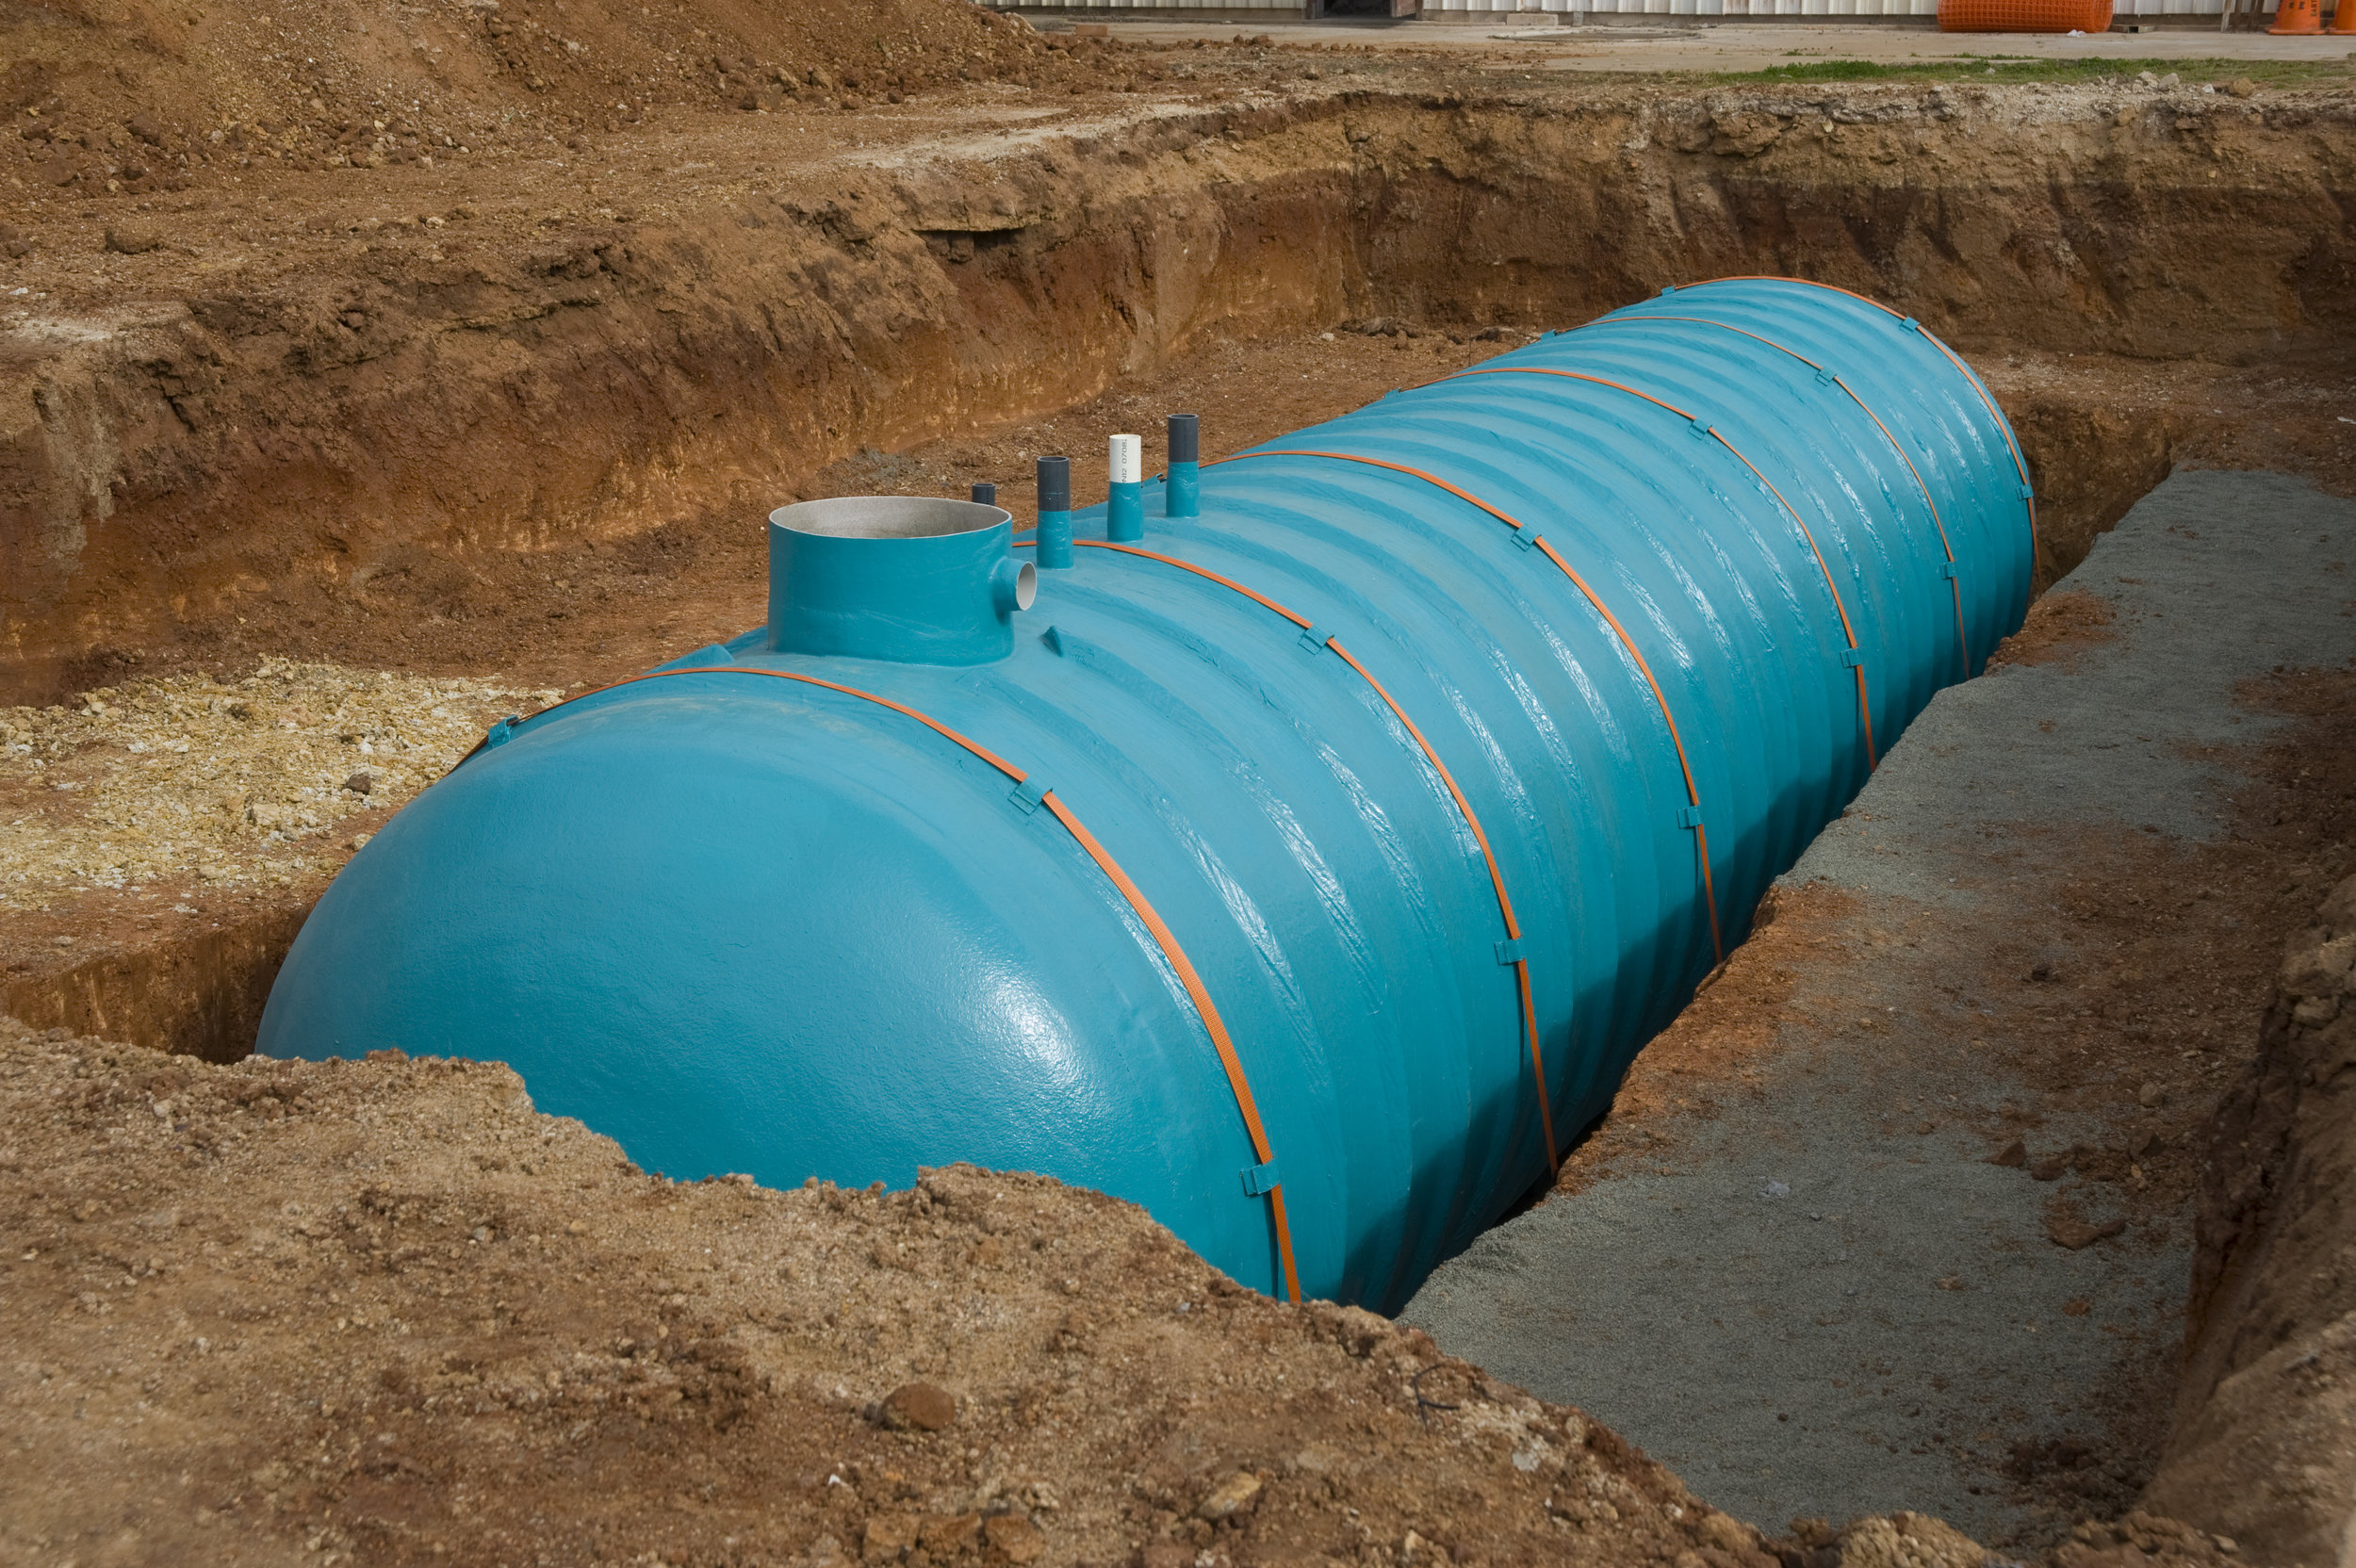 underground-rainwater-harvesting-tanks-01.jpg